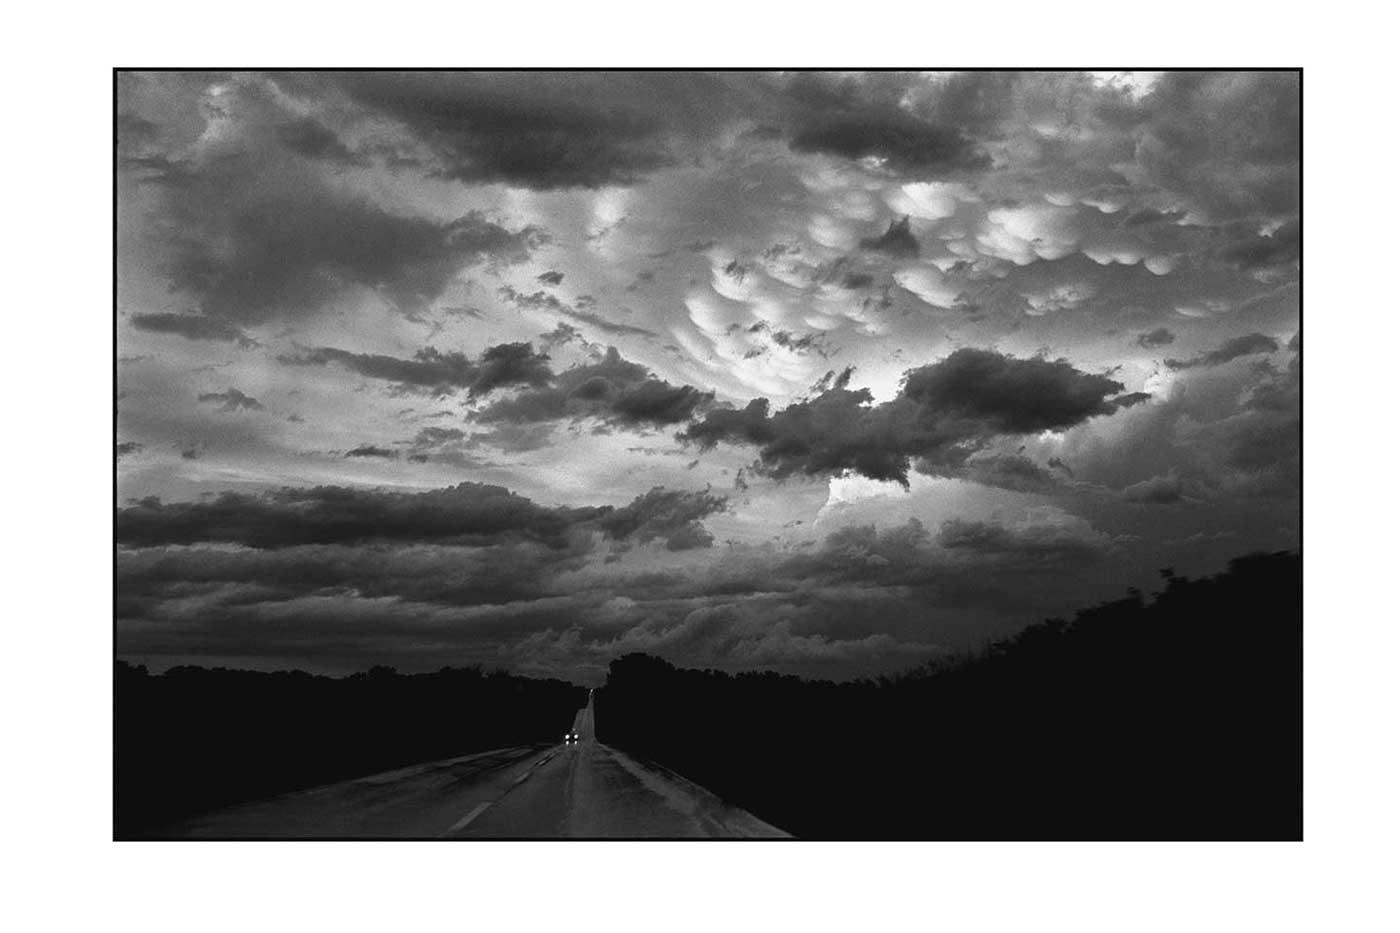 Highway 77, Nebraska, 1968